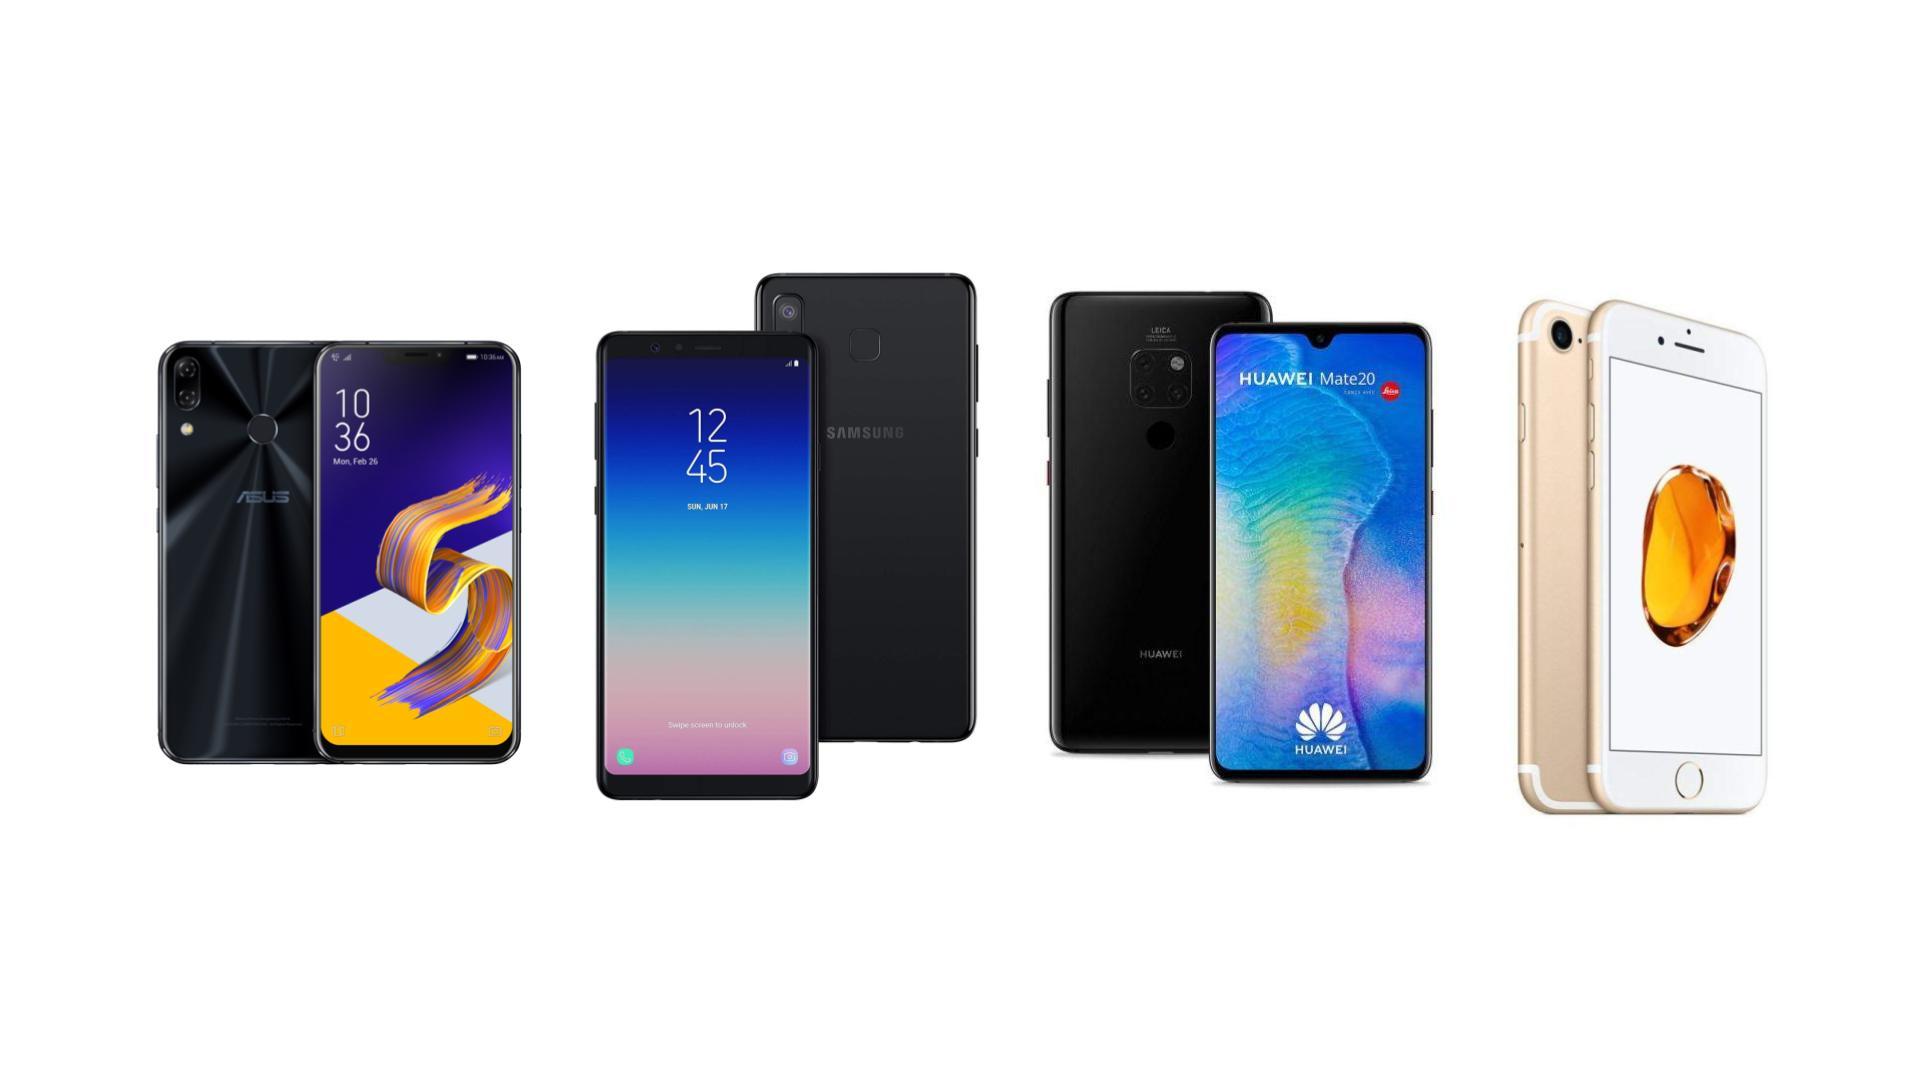 Huawei Mate 20 à 669 euros, iPhone 7 à 320 euros et Zenfone 5 269 euros sur eBay